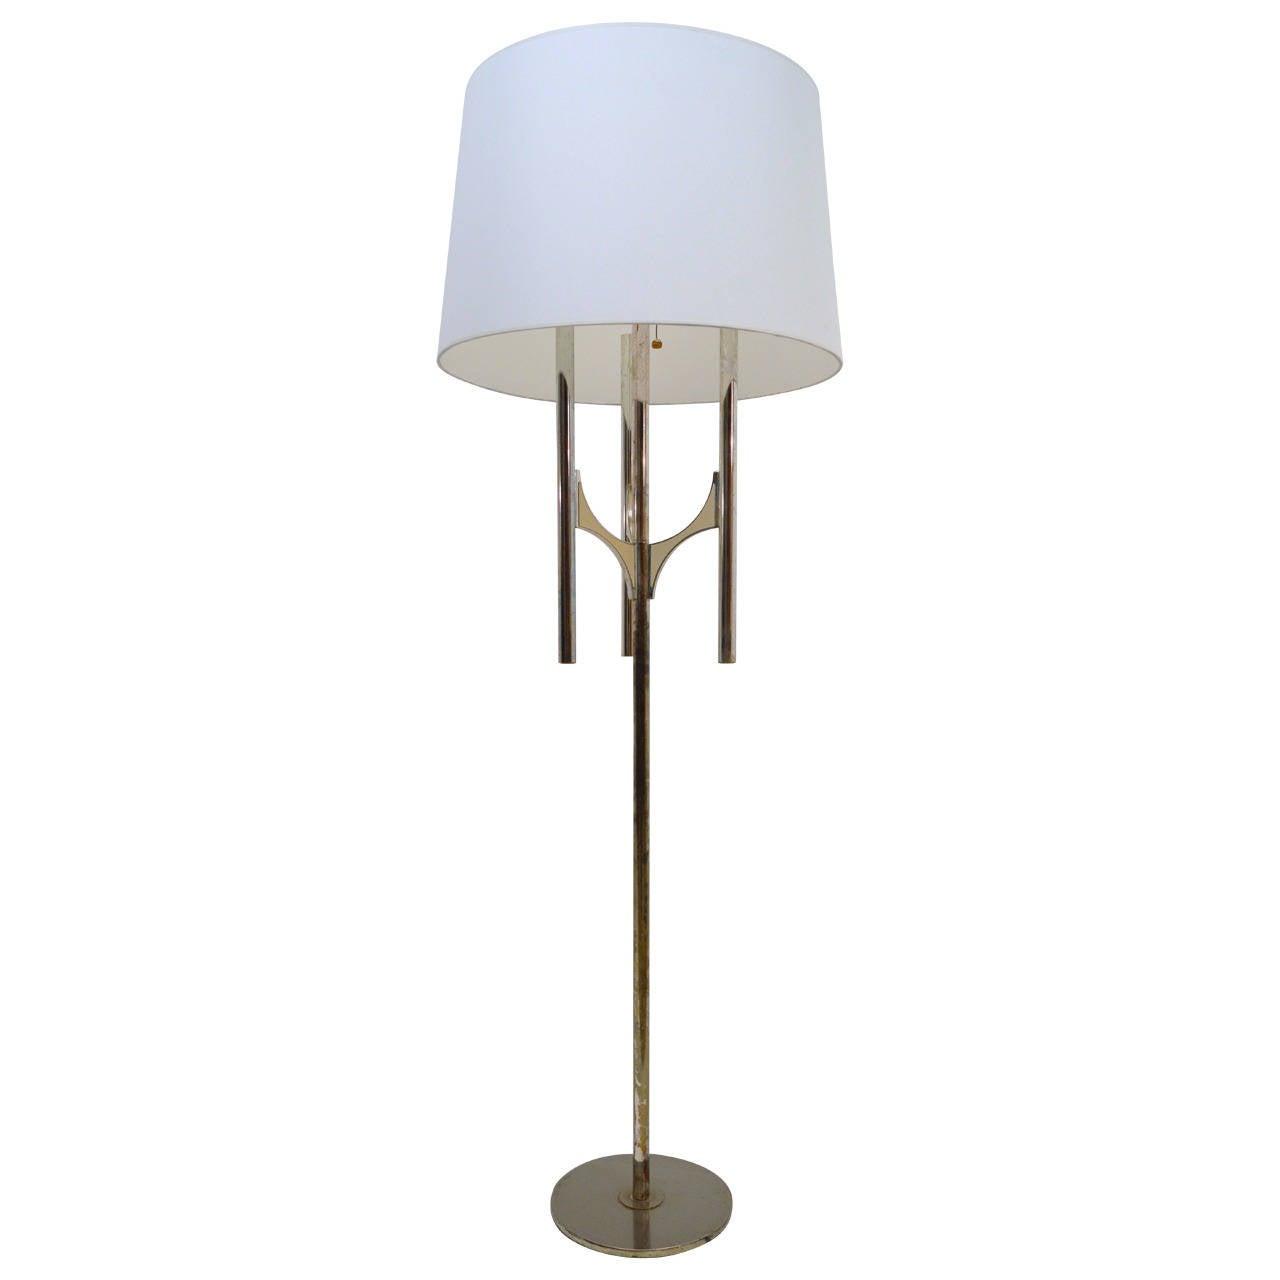 Floor lamp by gaetano sciolari 1970s at 1stdibs for 1970s floor lamps